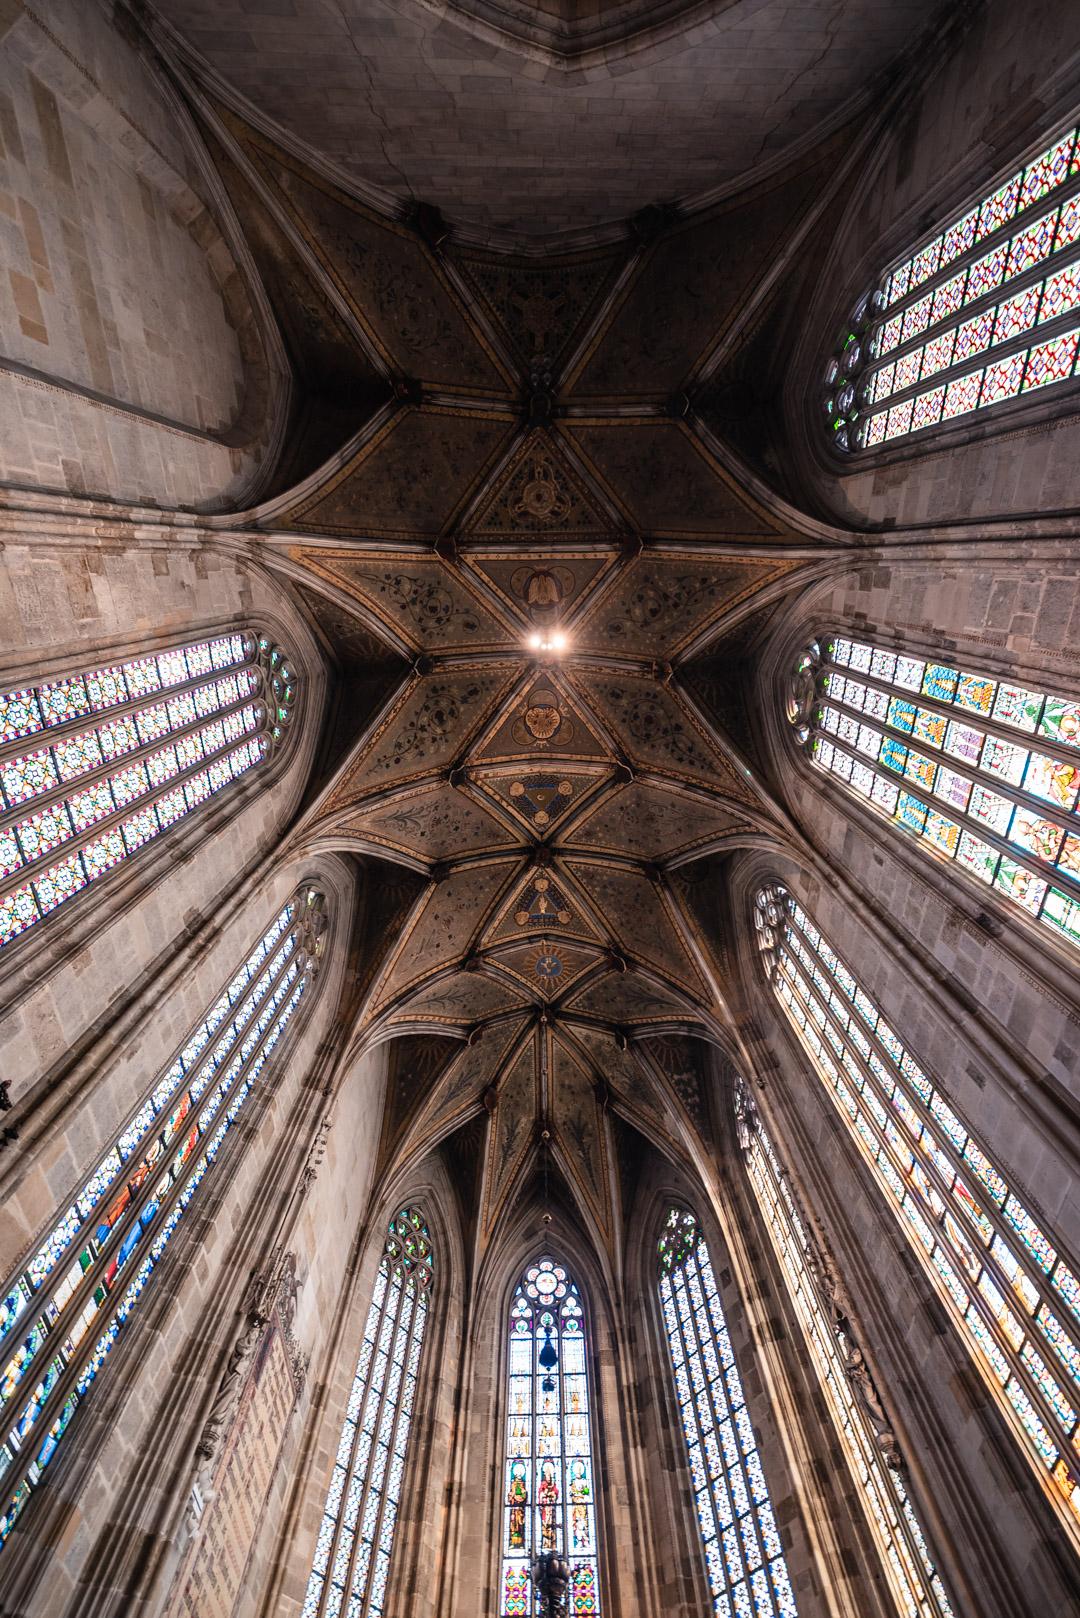 Interior Inside Saint Martin's Cathedral Stained Glass Windows Gothic Bratislava Slovakia Urban City Eastern Europe